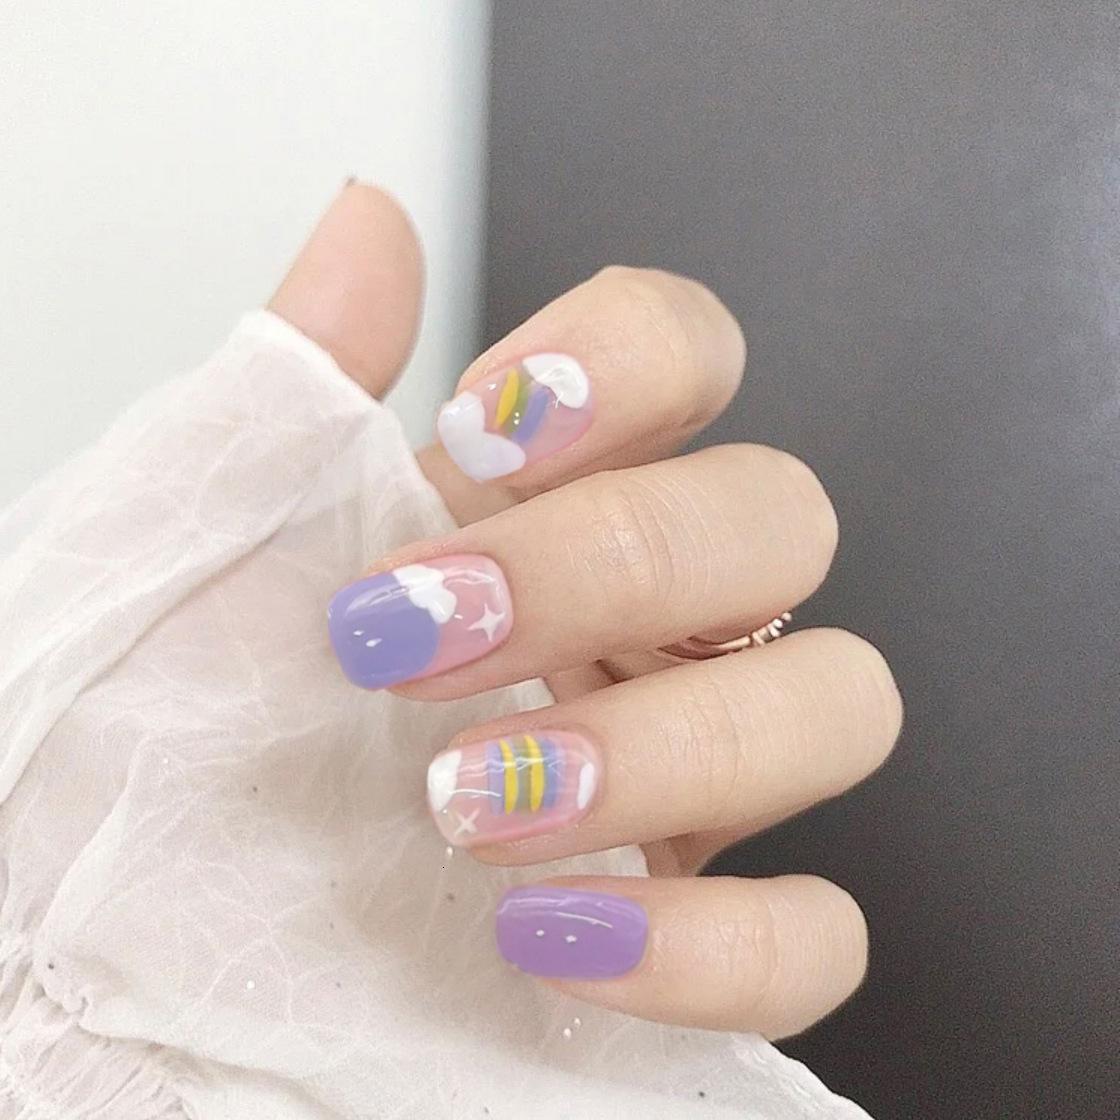 Decorated Nail Hand Stylist Diy Nina Pd-78 Blue Purple Rainbow False Nail Patch Wear Enhancement Finished